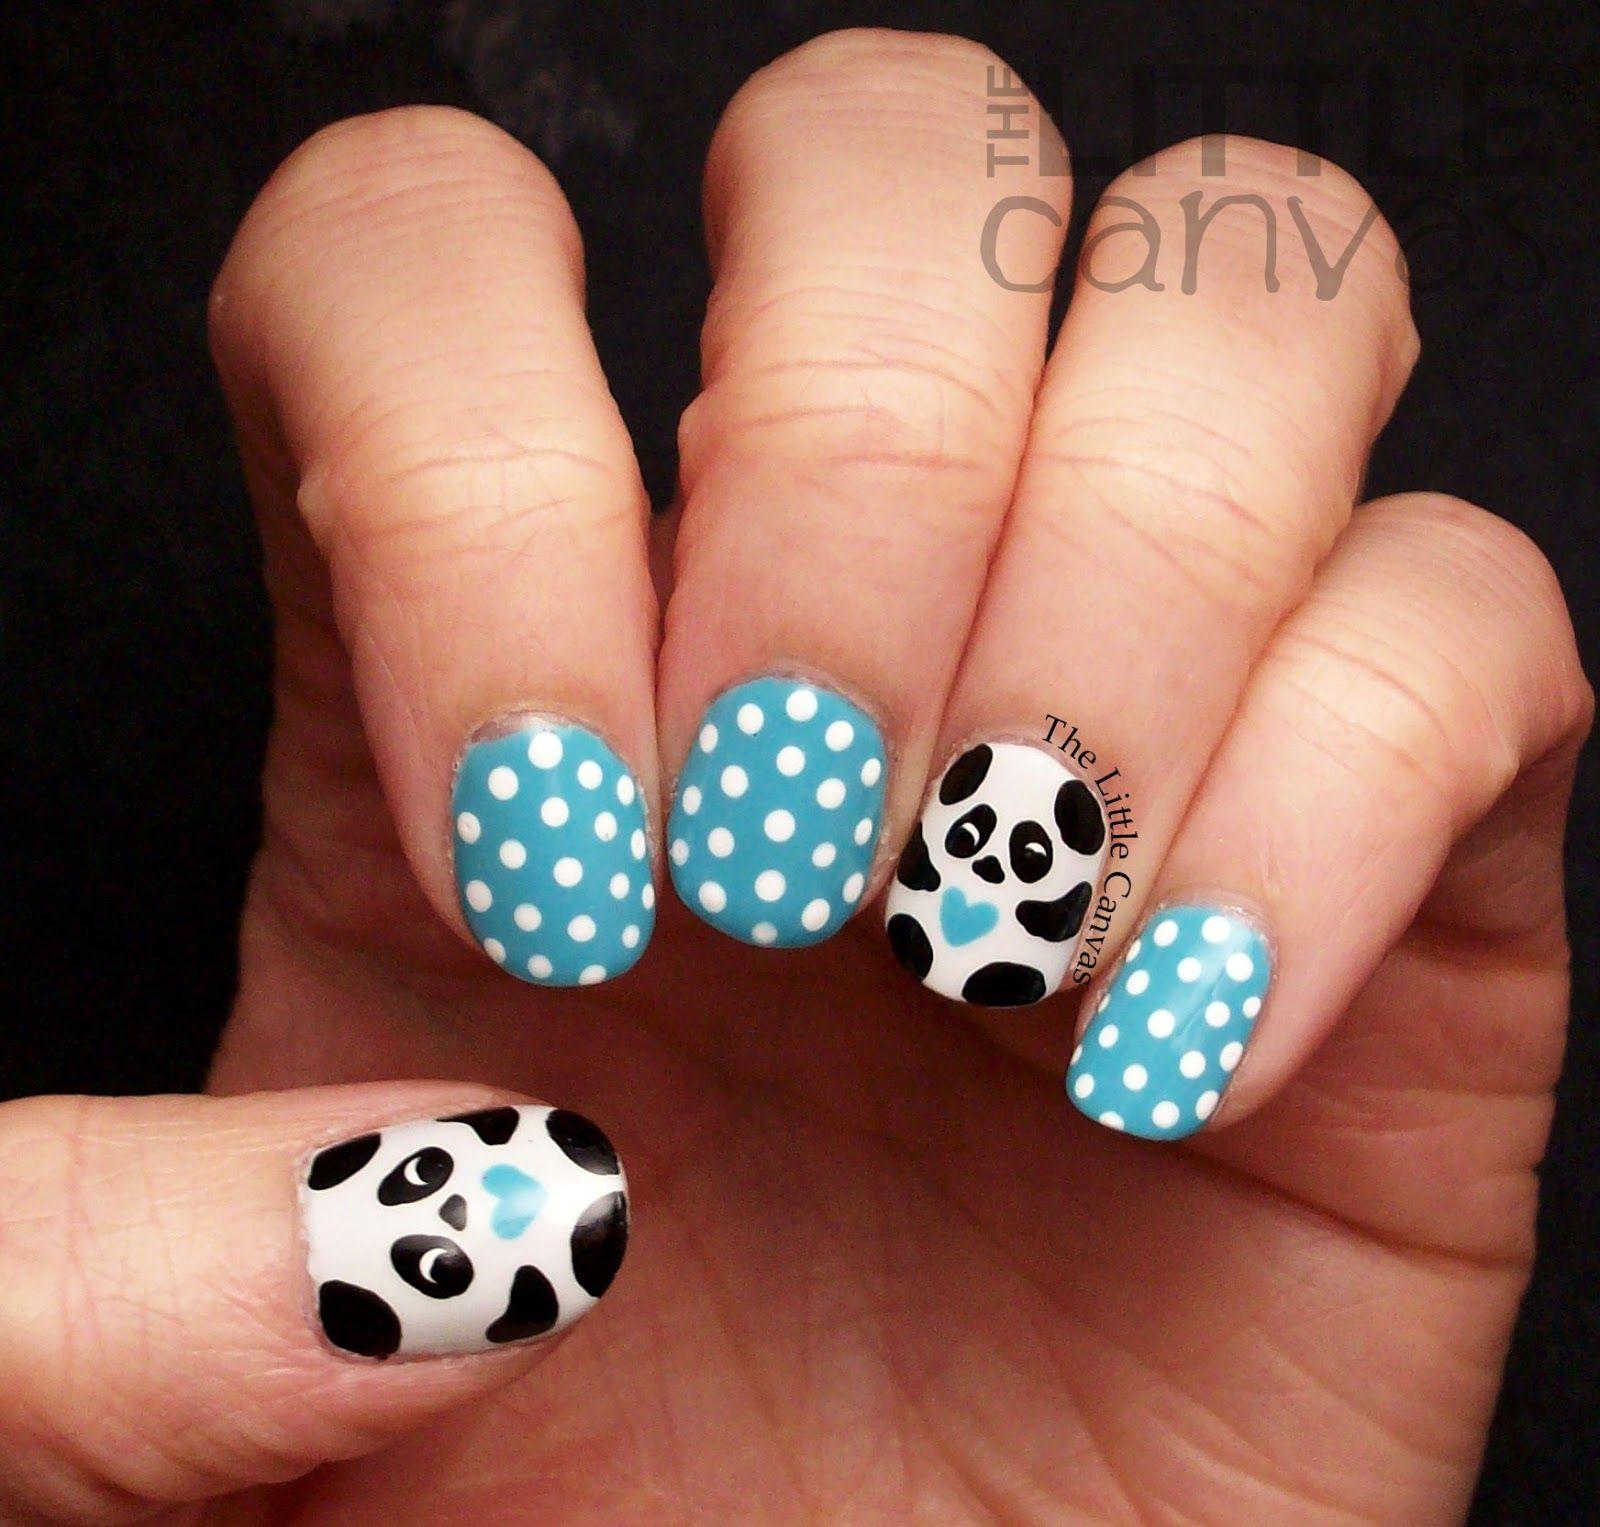 The Little Canvas: Panda Nail Art | Nails | Pinterest | Panda nail ...